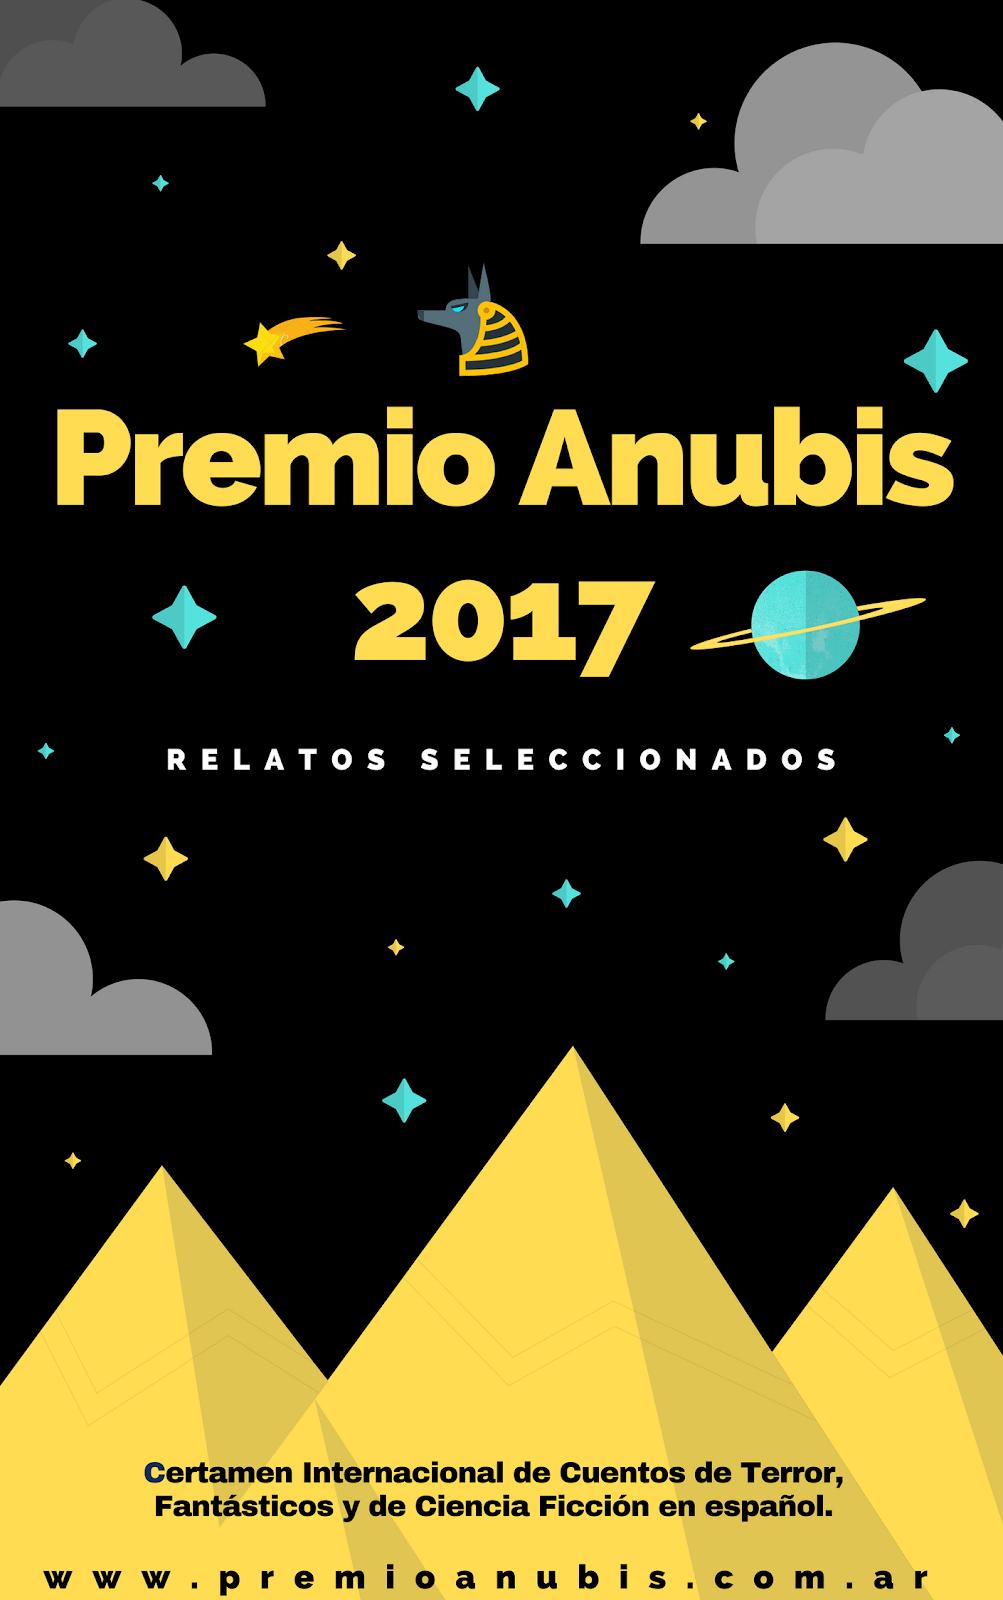 Antología Premio Anubis 2017